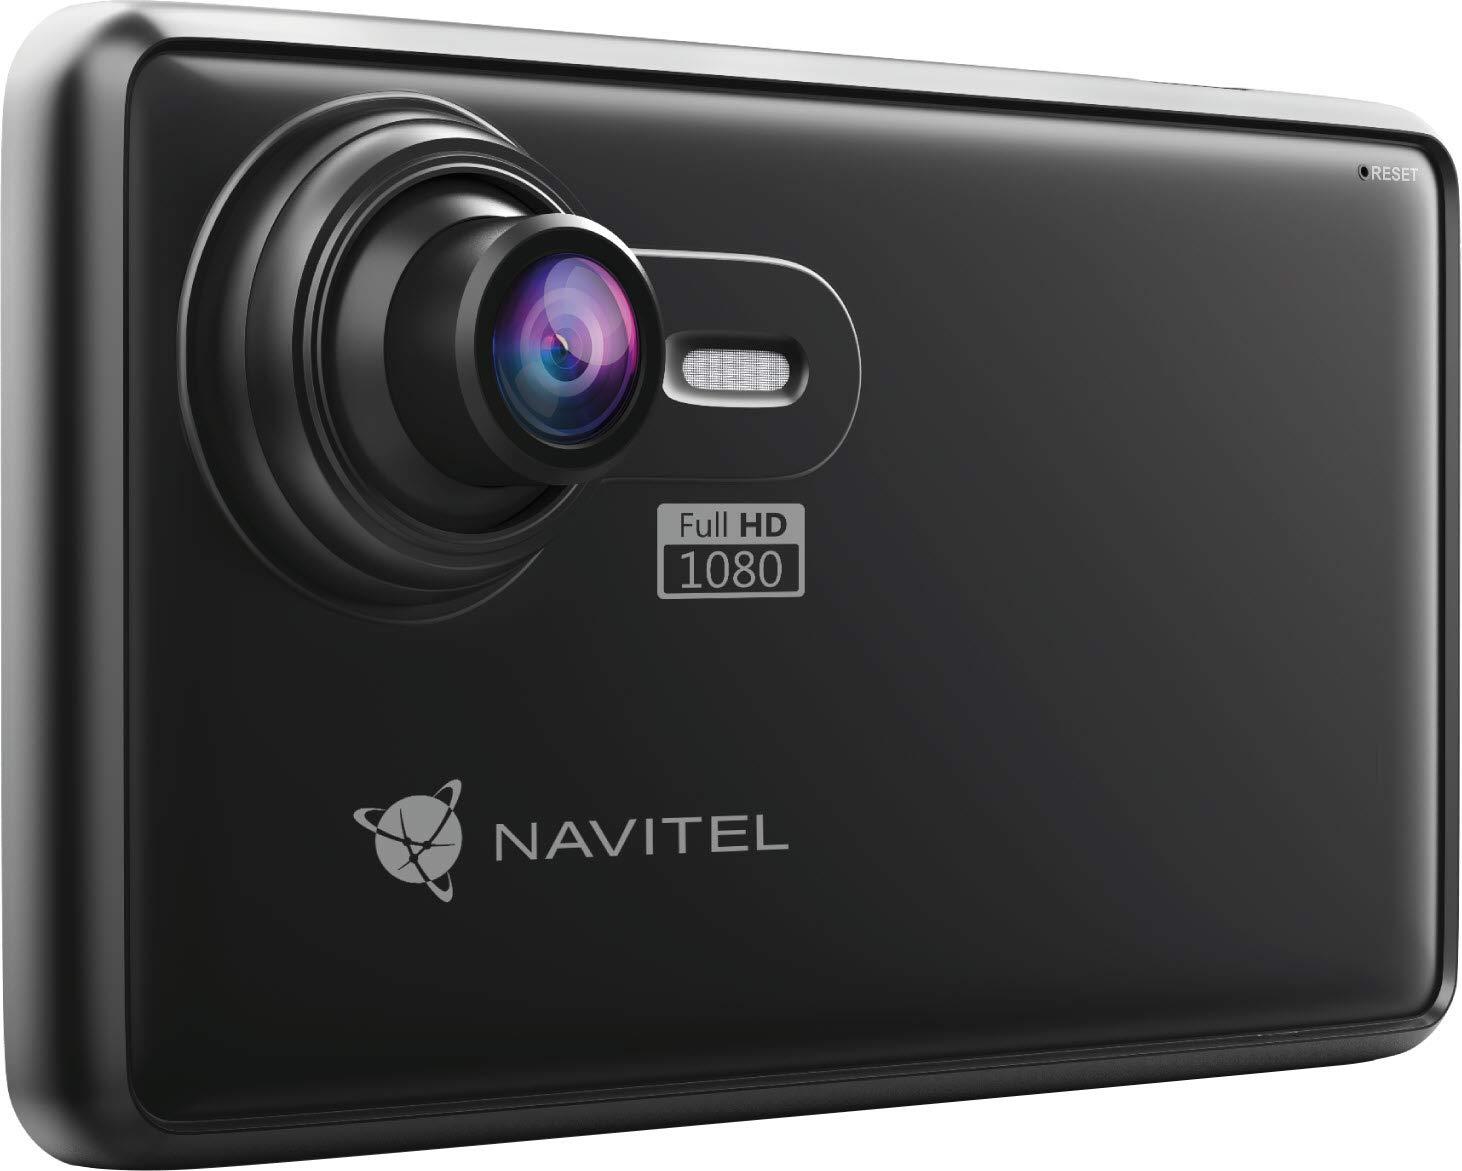 Navitel-RE900-127-cm-5-Zoll-Touchscreen-Navigationsgert-GPS-Multi-1280-x-720-Pixel-Speicherkarte-MicroSD-TransFlash-16-GB-Schwarz